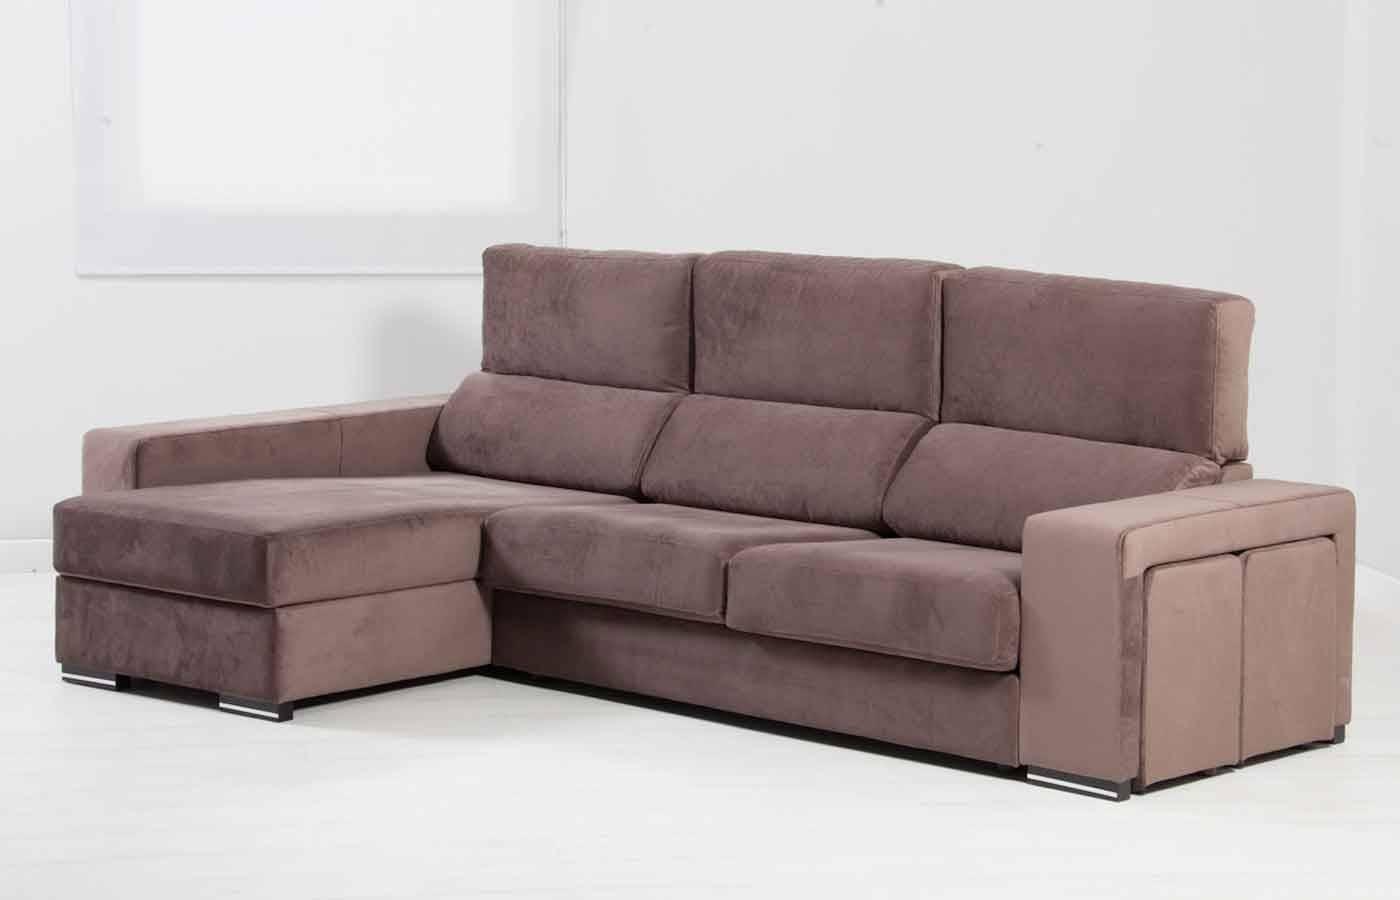 Chaise longue venecia dismobel for Sillones chaise longue